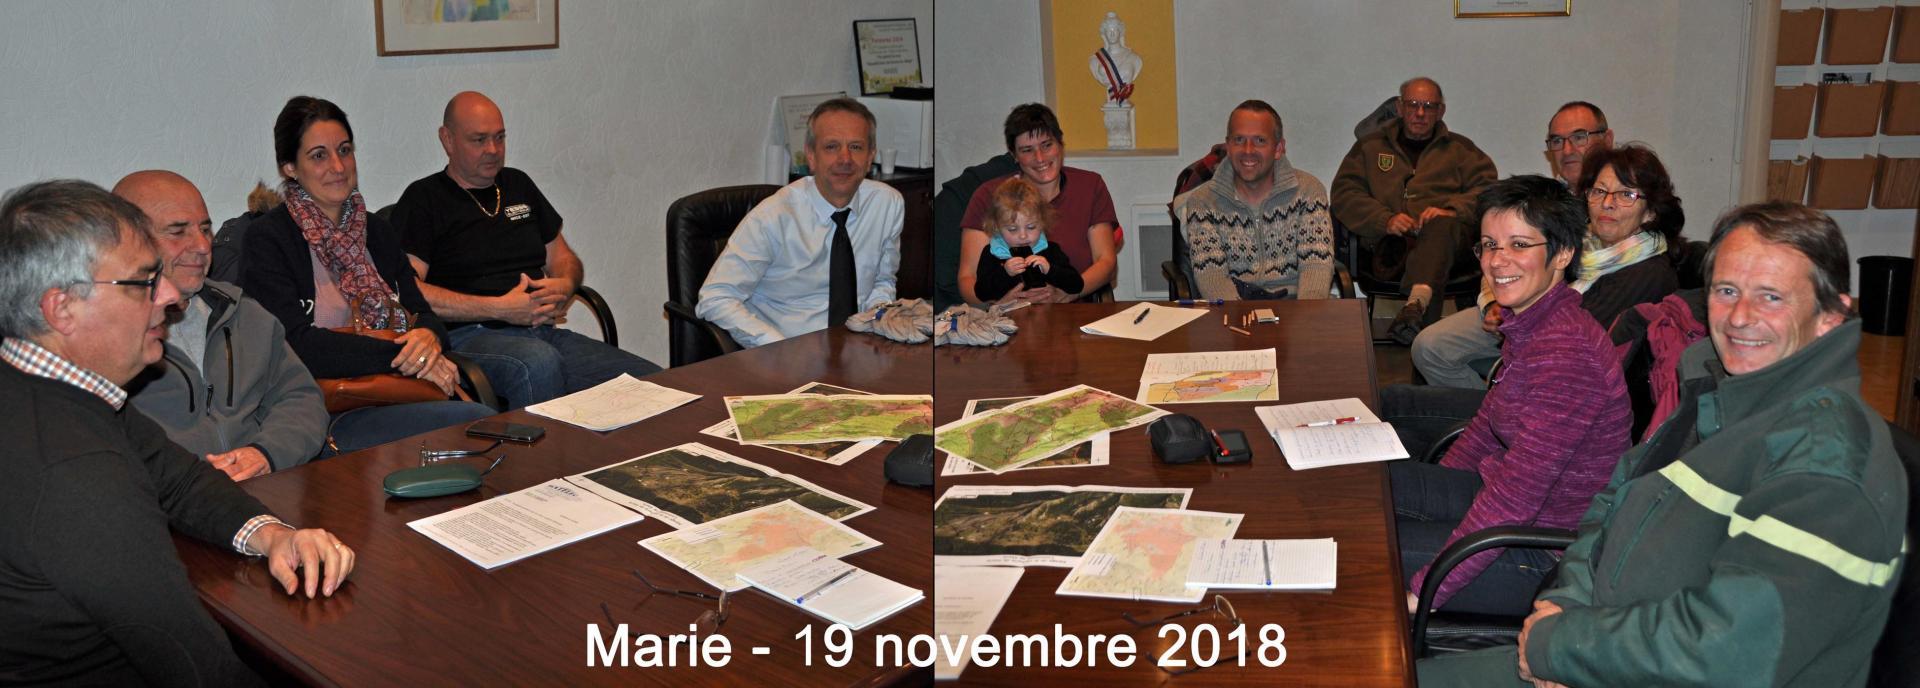 18 11 19 reunion pastoralisme